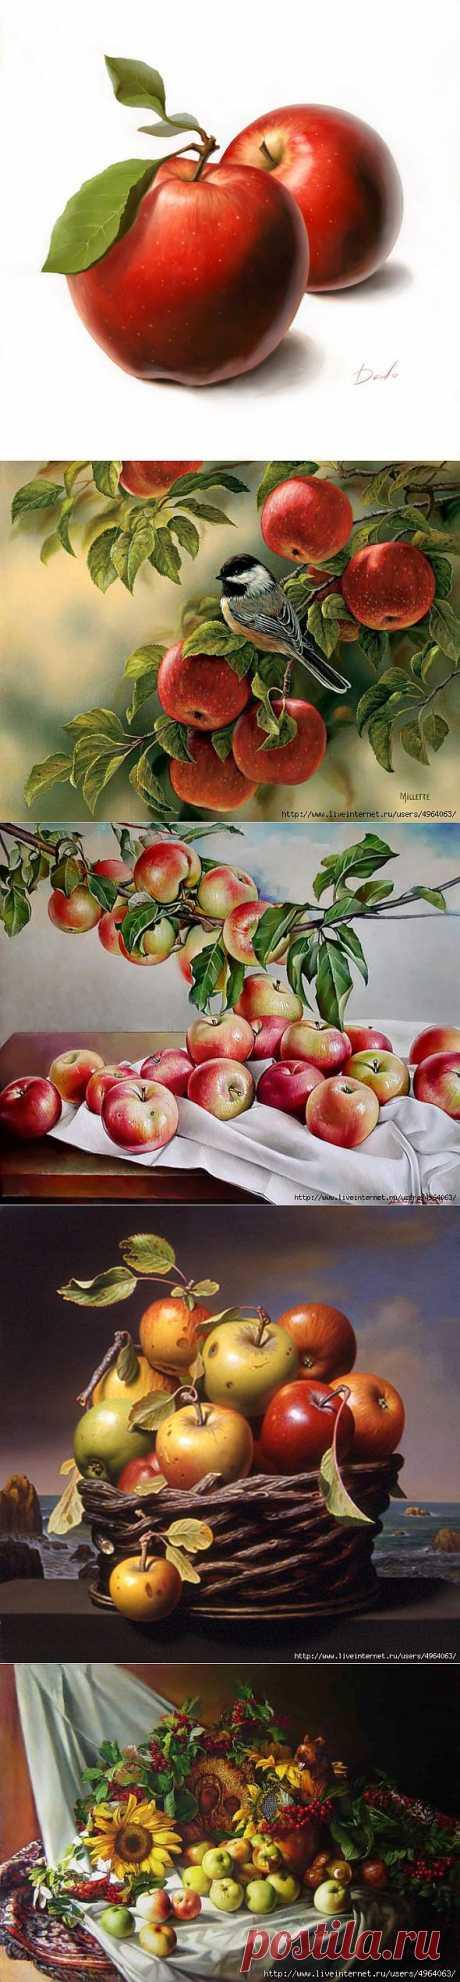 Яблоки для декупажа)).